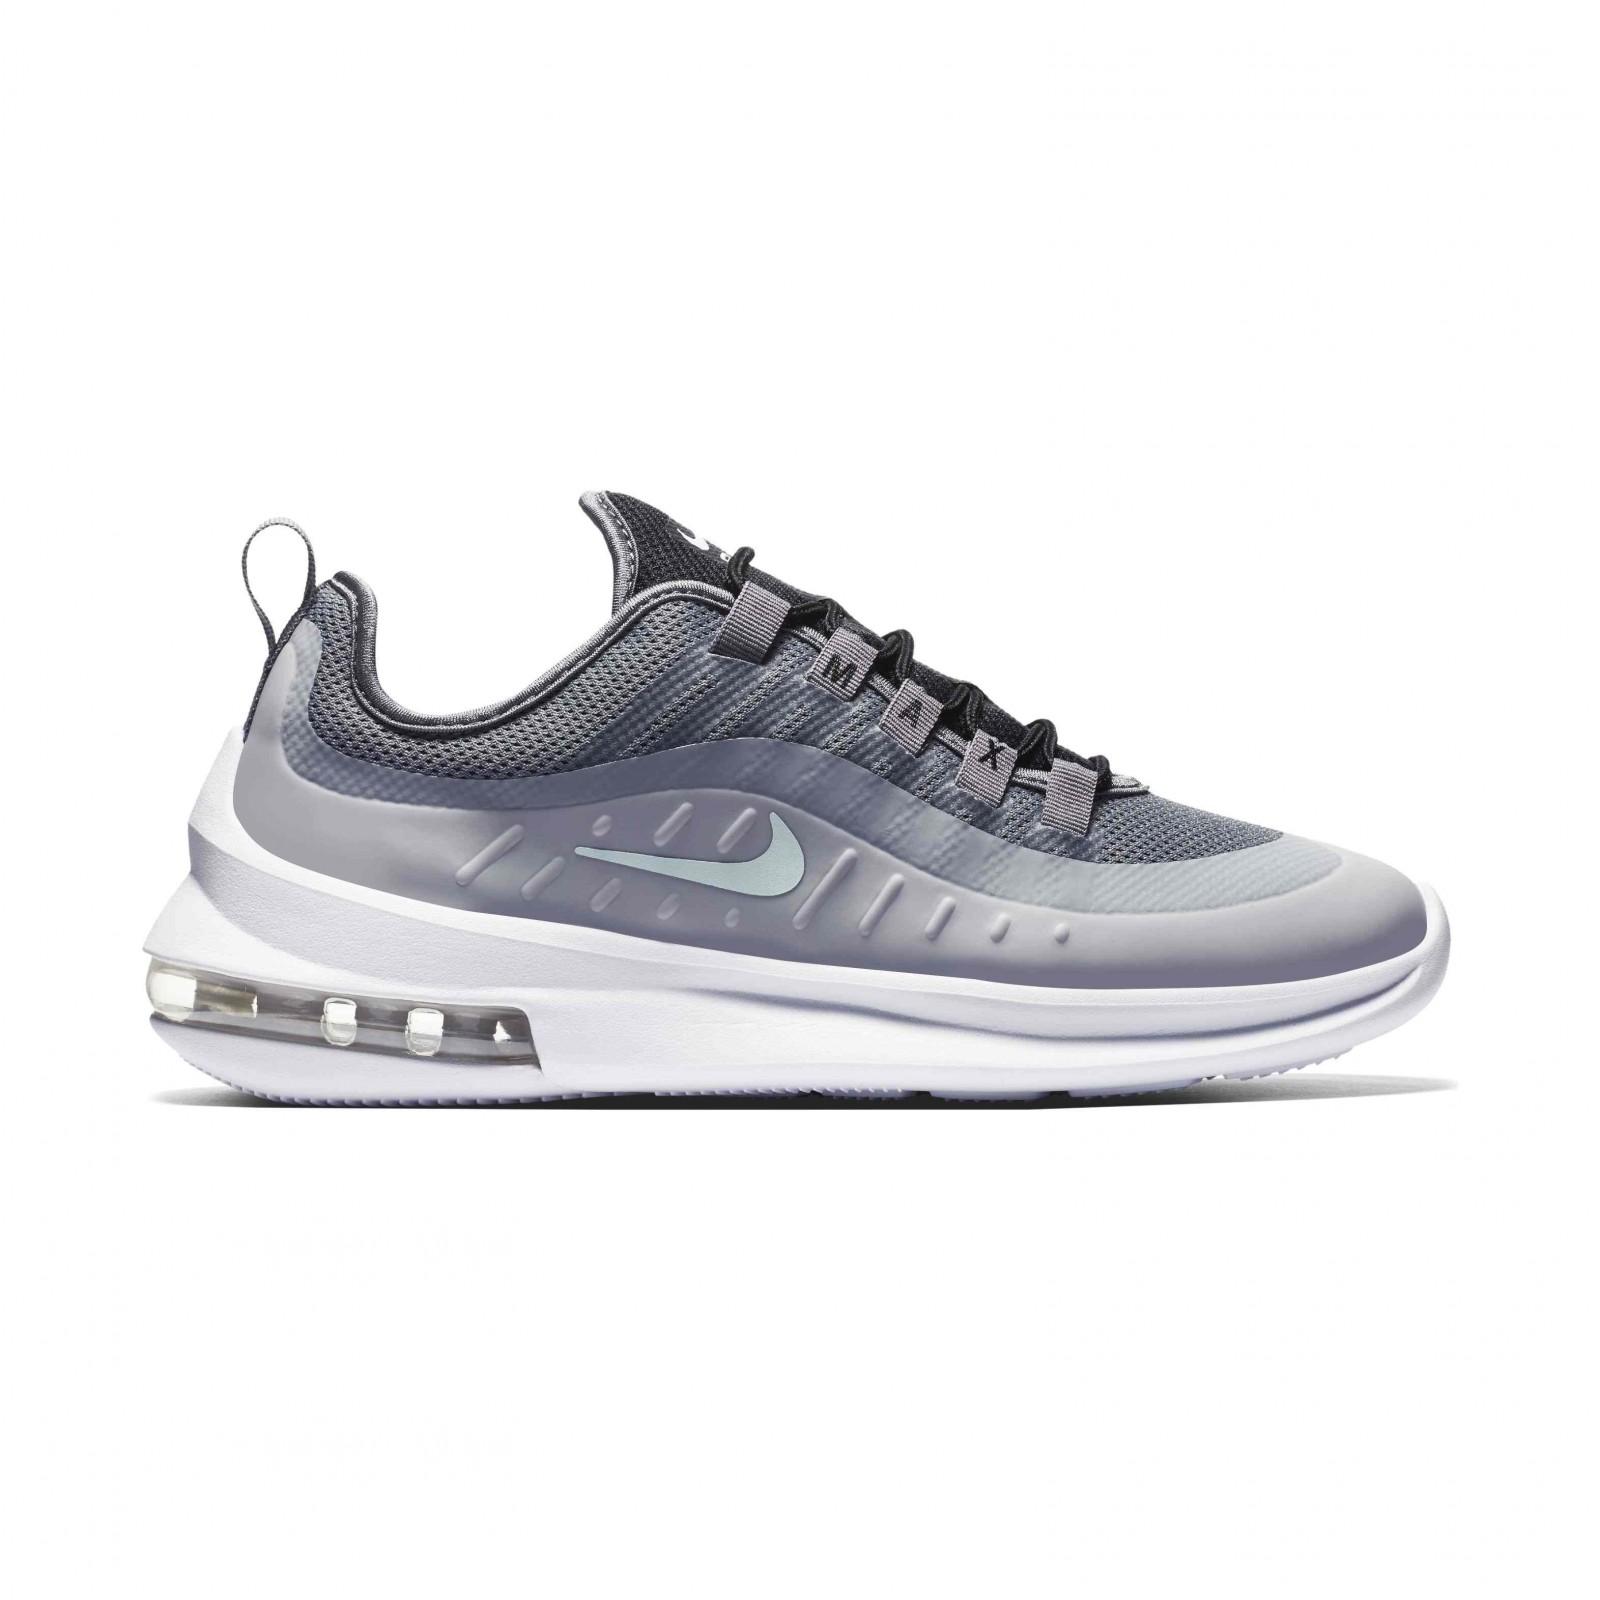 Dámské Tenisky Nike WMNS AIR MAX AXIS COOL GREY IGLOO-WHITE-PURE PLA ... 2f46485de96